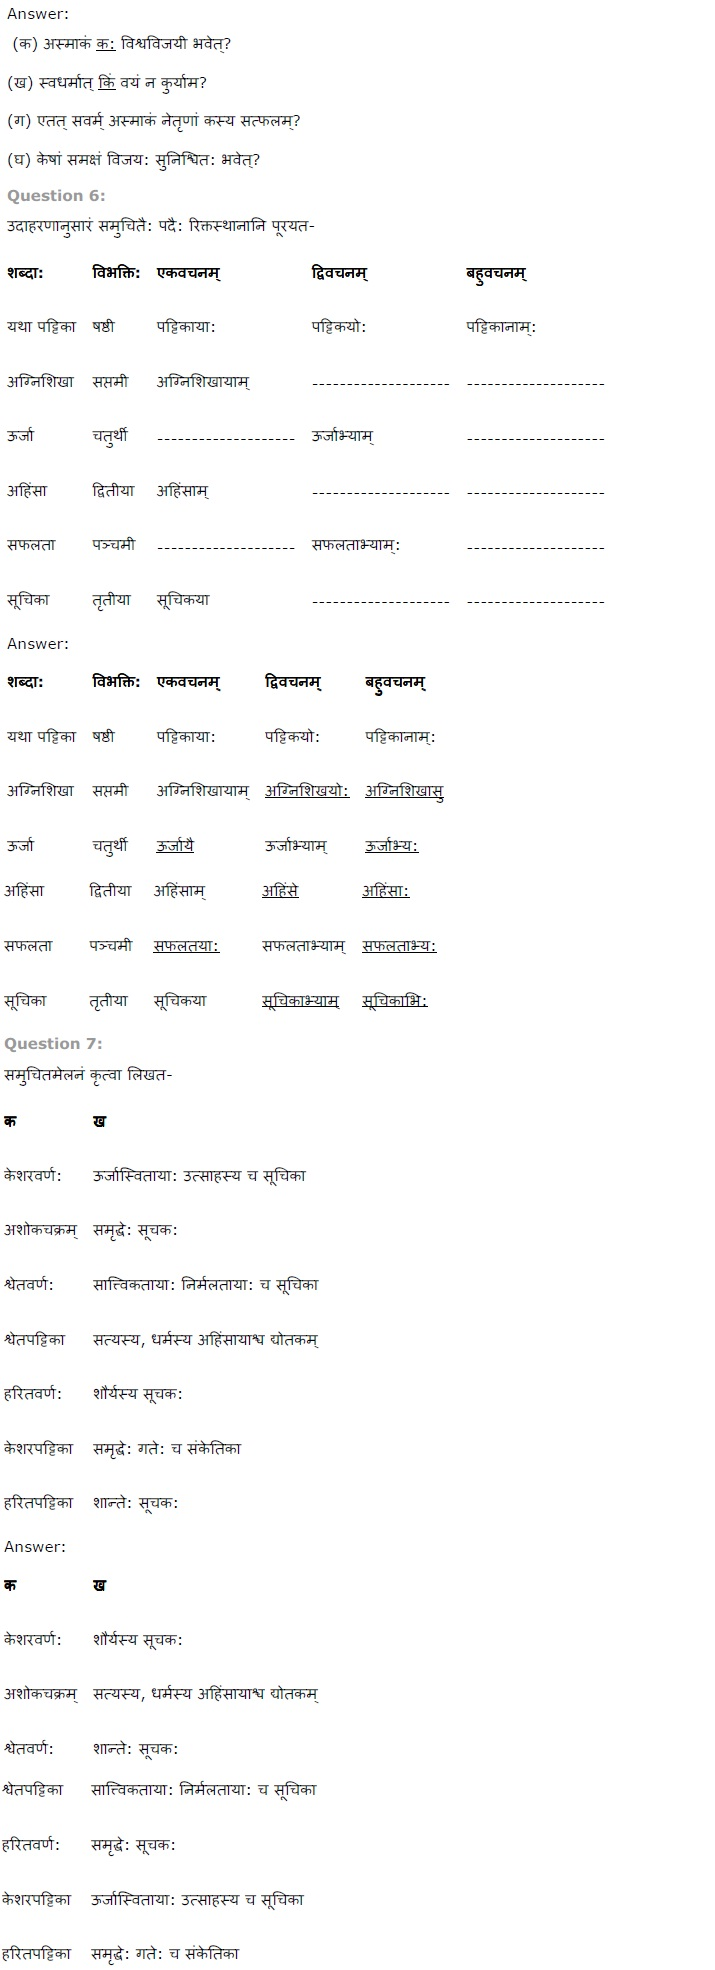 NCERT Solutions For Class 7th Sanskrit Chapter 8 त्रिवर्ण ध्वज PDF Download